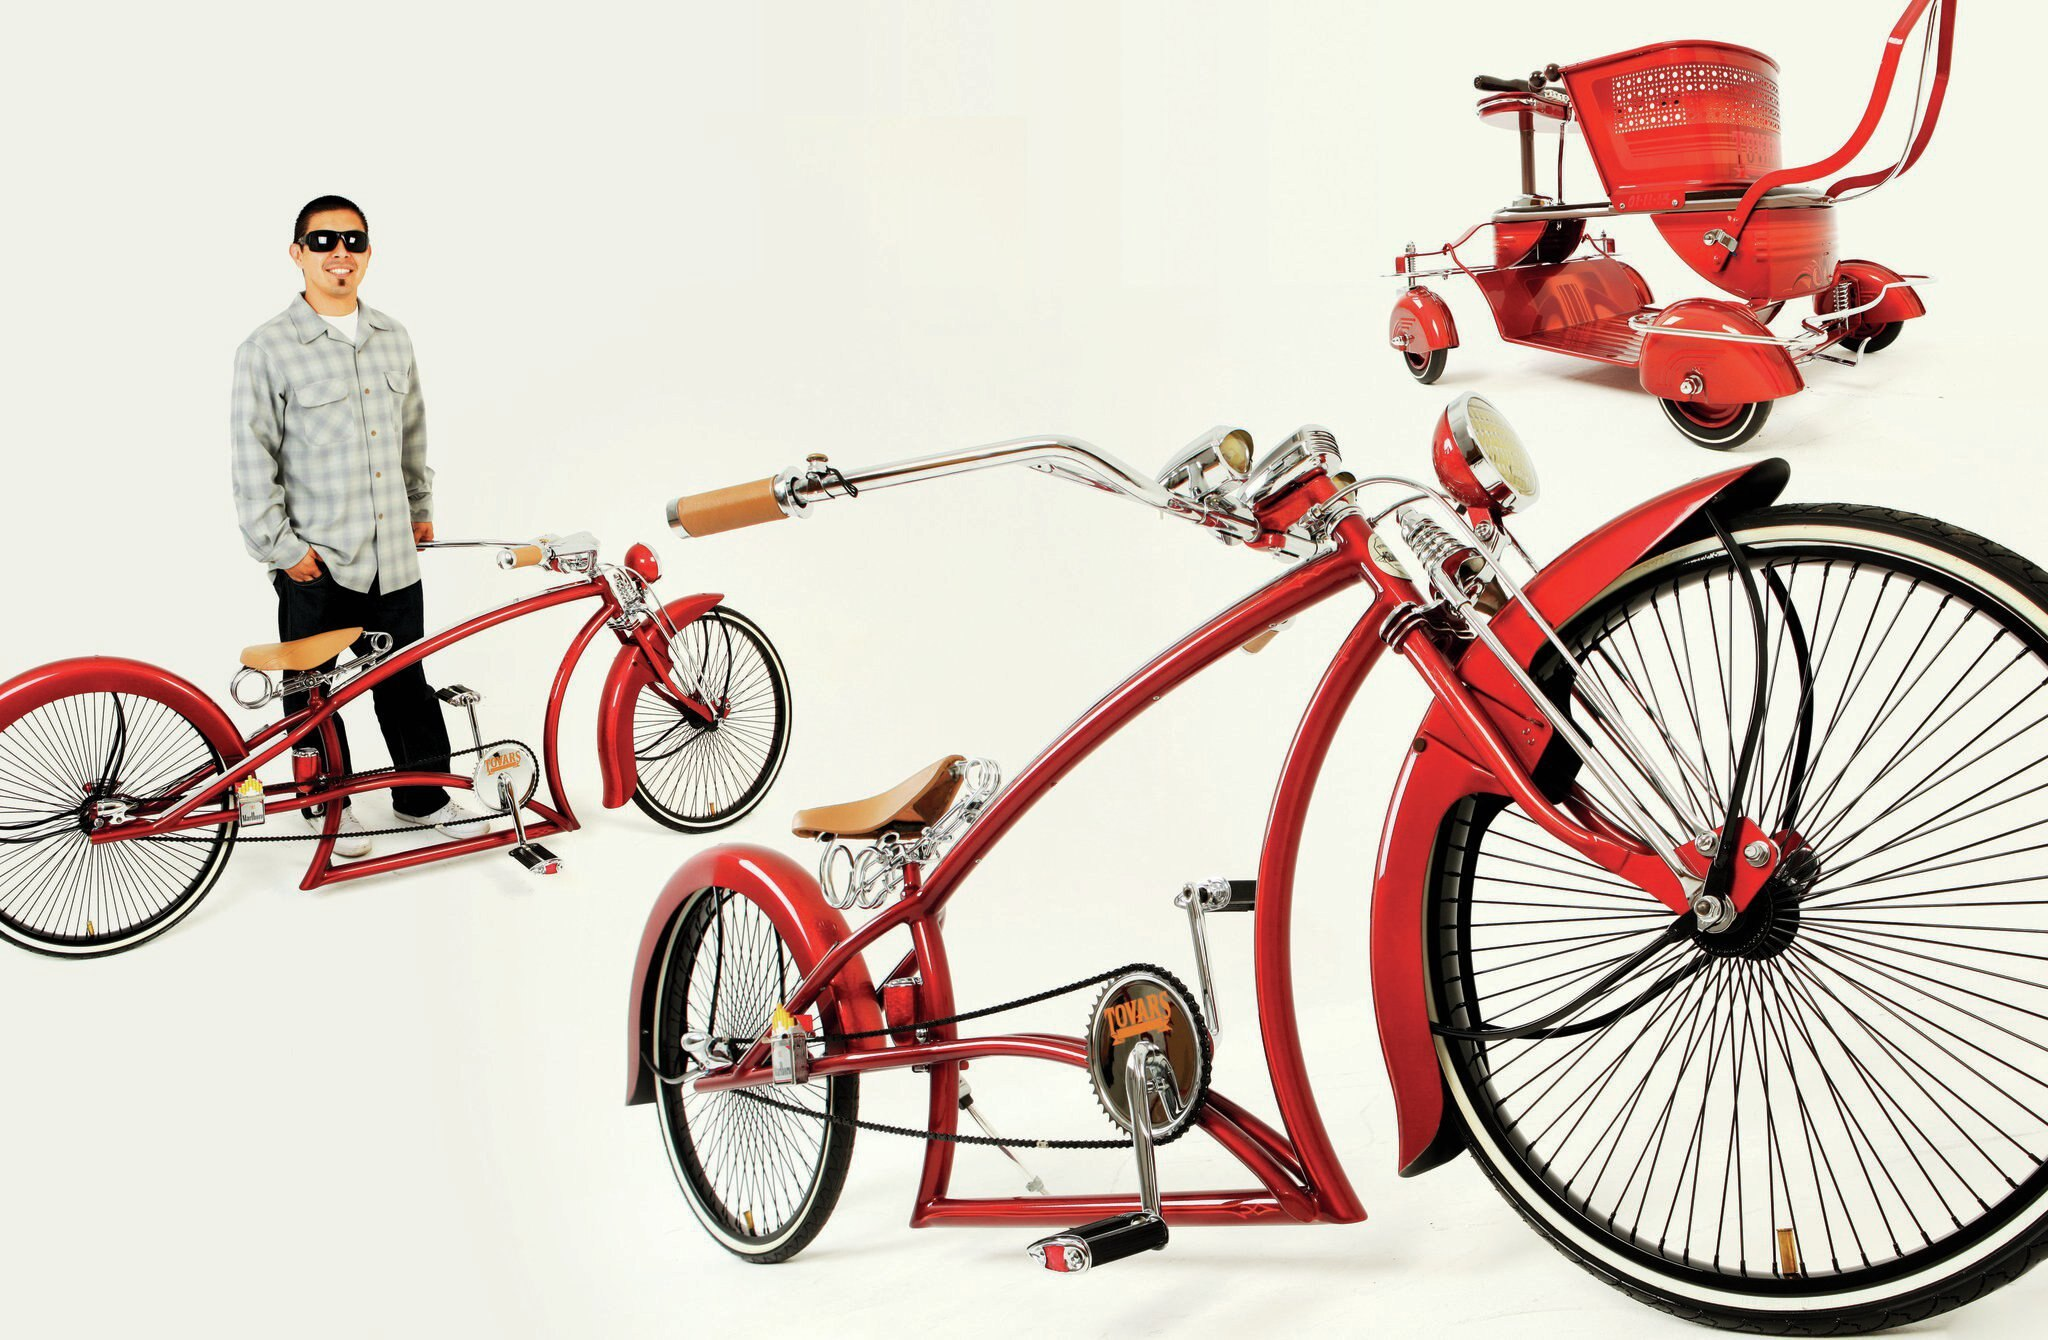 daniel-tovar-lowrider-bicycle4